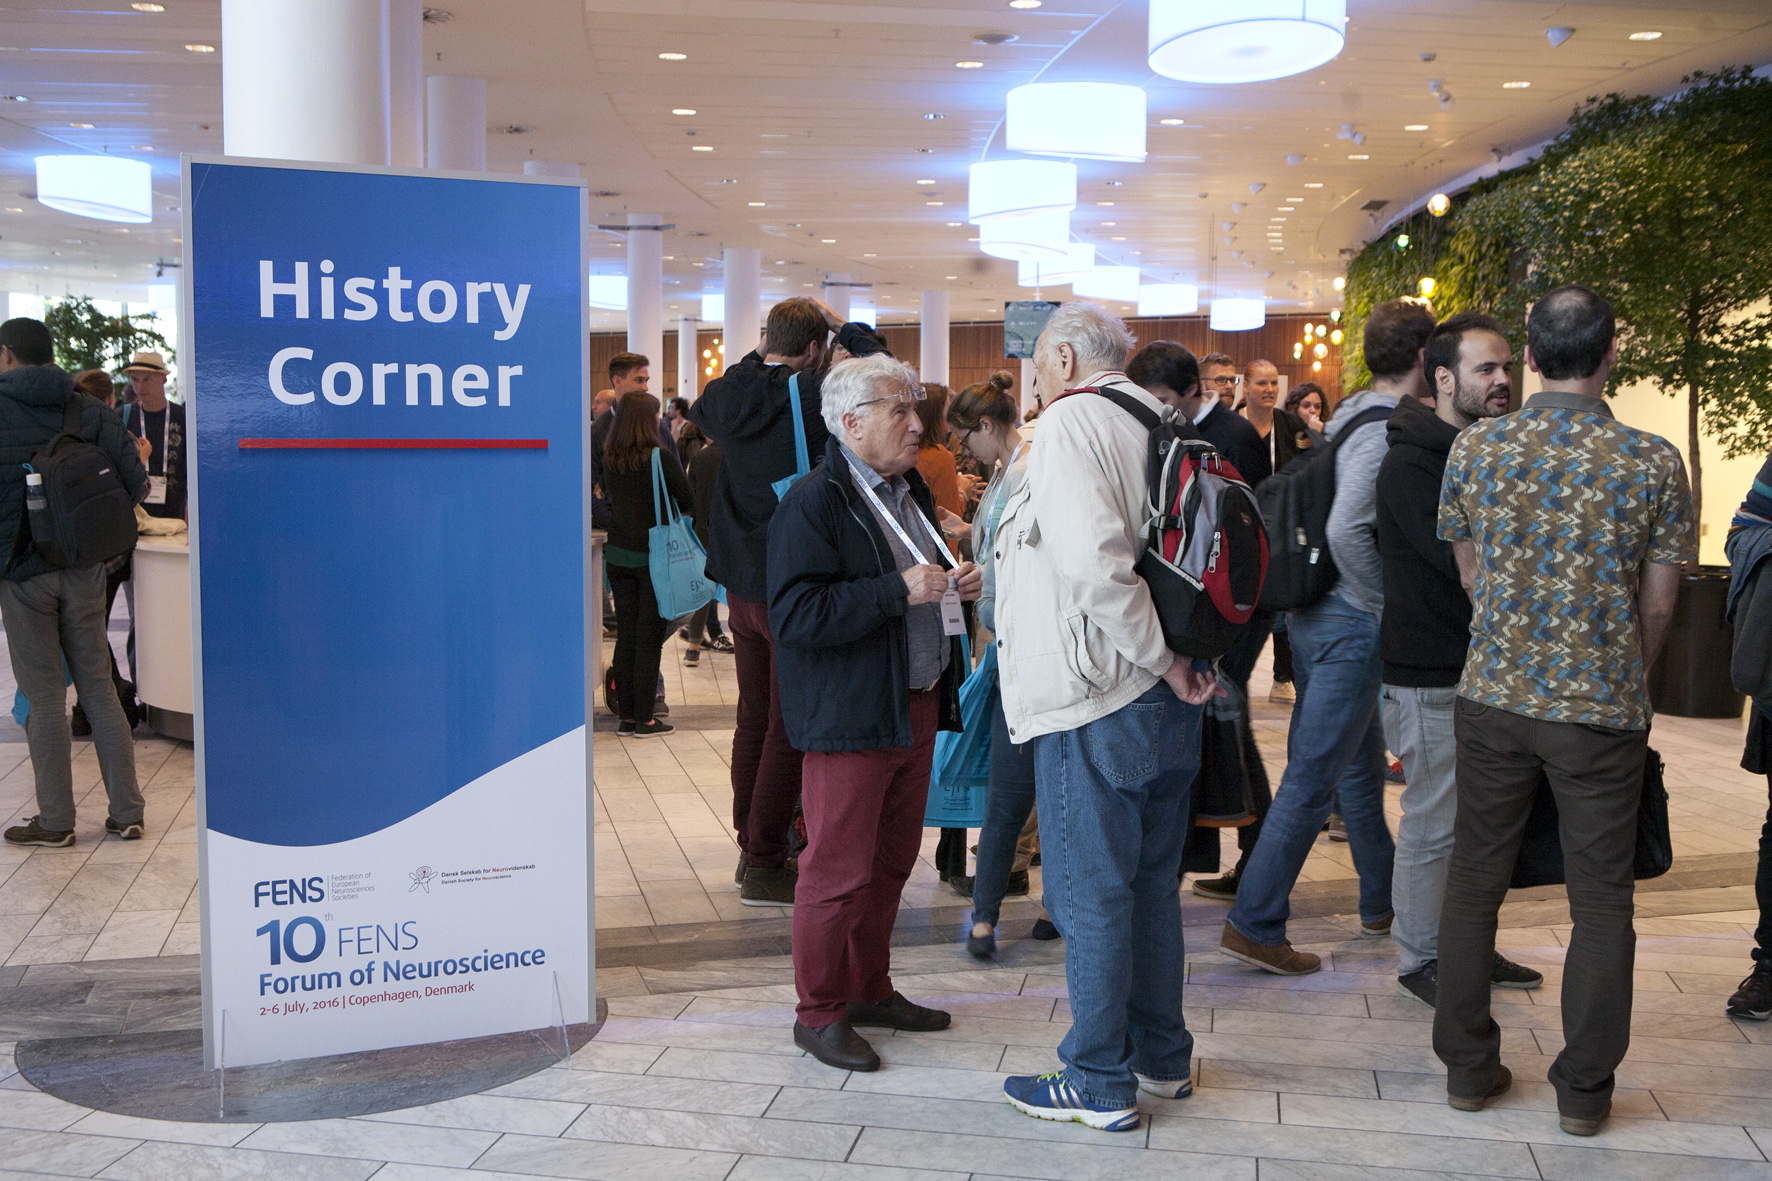 FENS History Corner